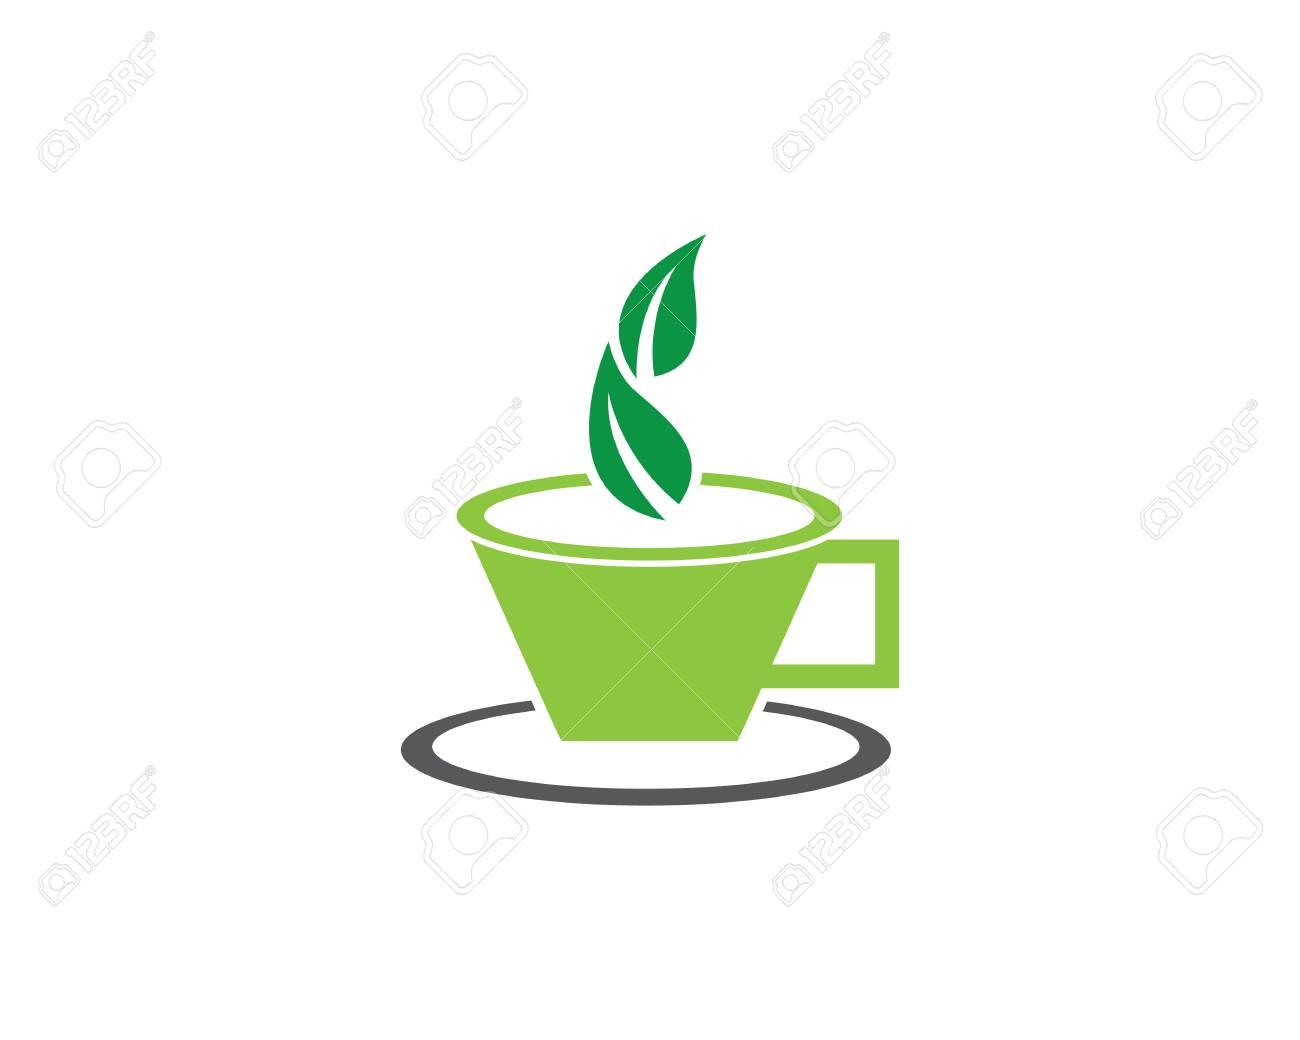 Tea cup logo template vector icon illustration design royalty free tea cup logo template vector icon illustration design stock vector 106387177 maxwellsz